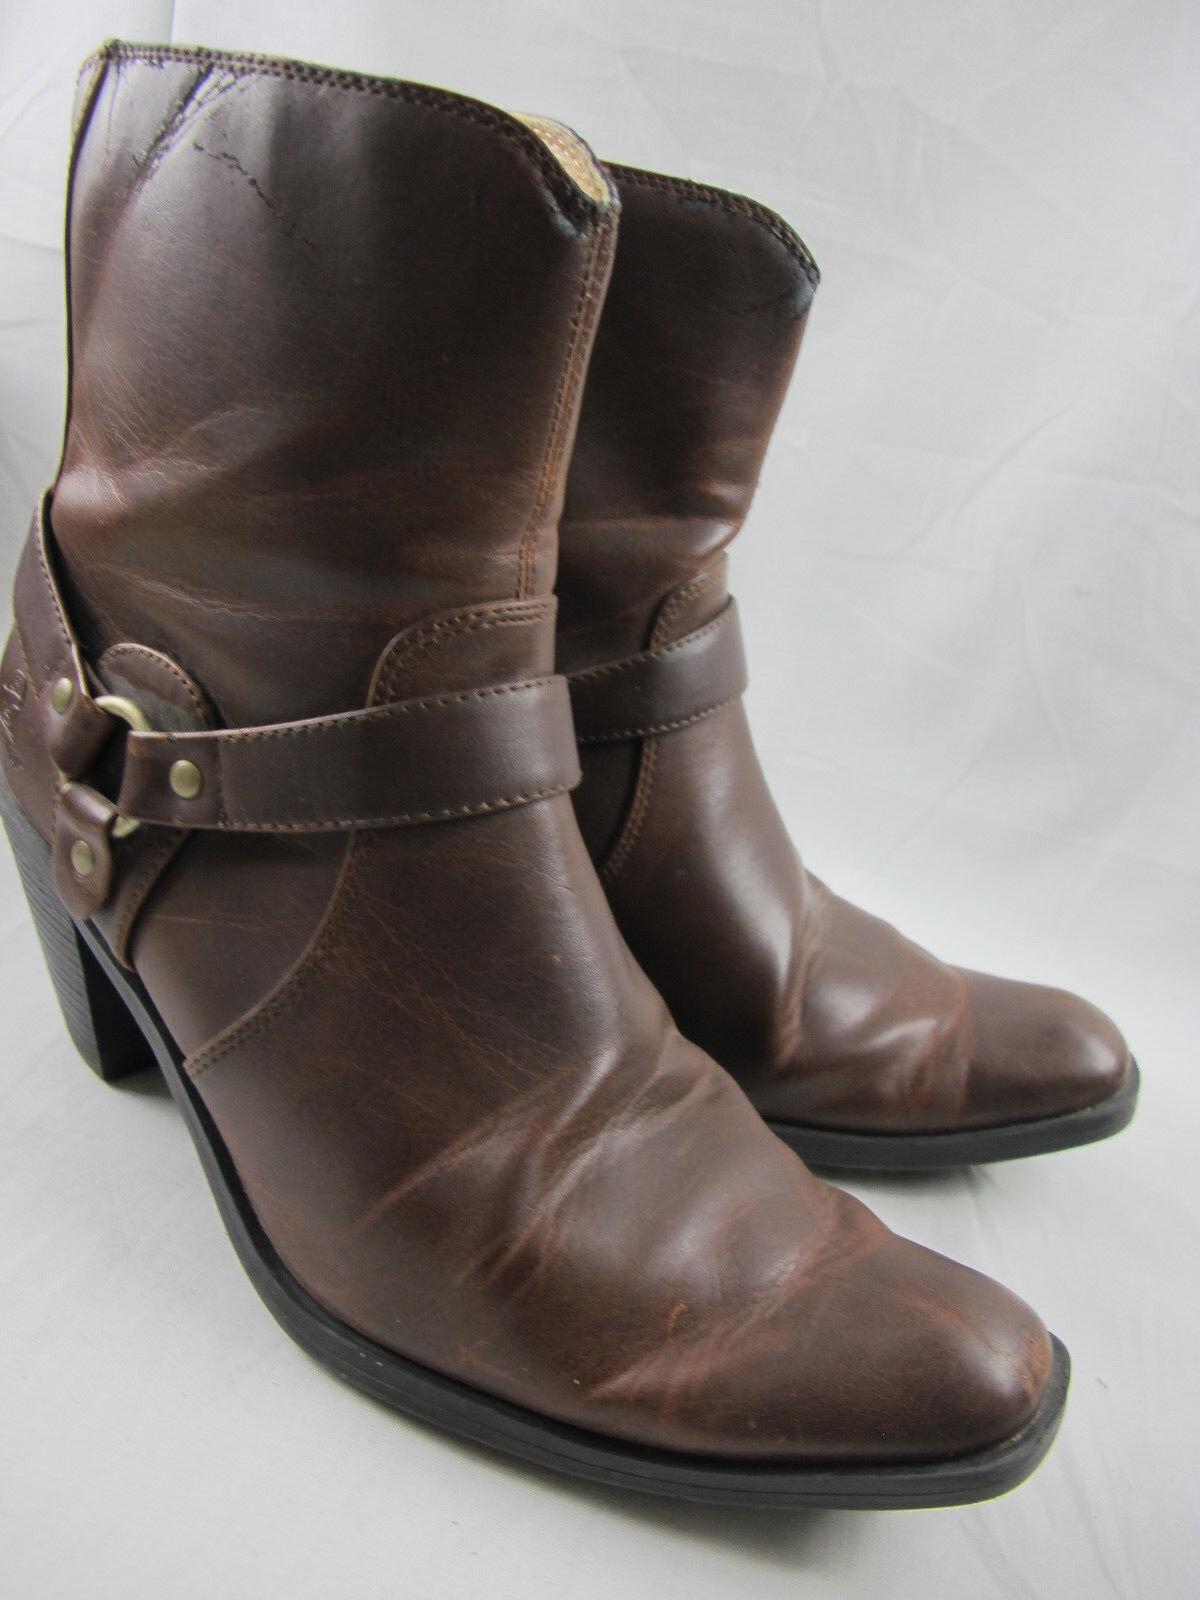 Women's Durango Crush Brown Heartbreaker Boot Texas Size 9 M Cowgirl Cowboy Zip